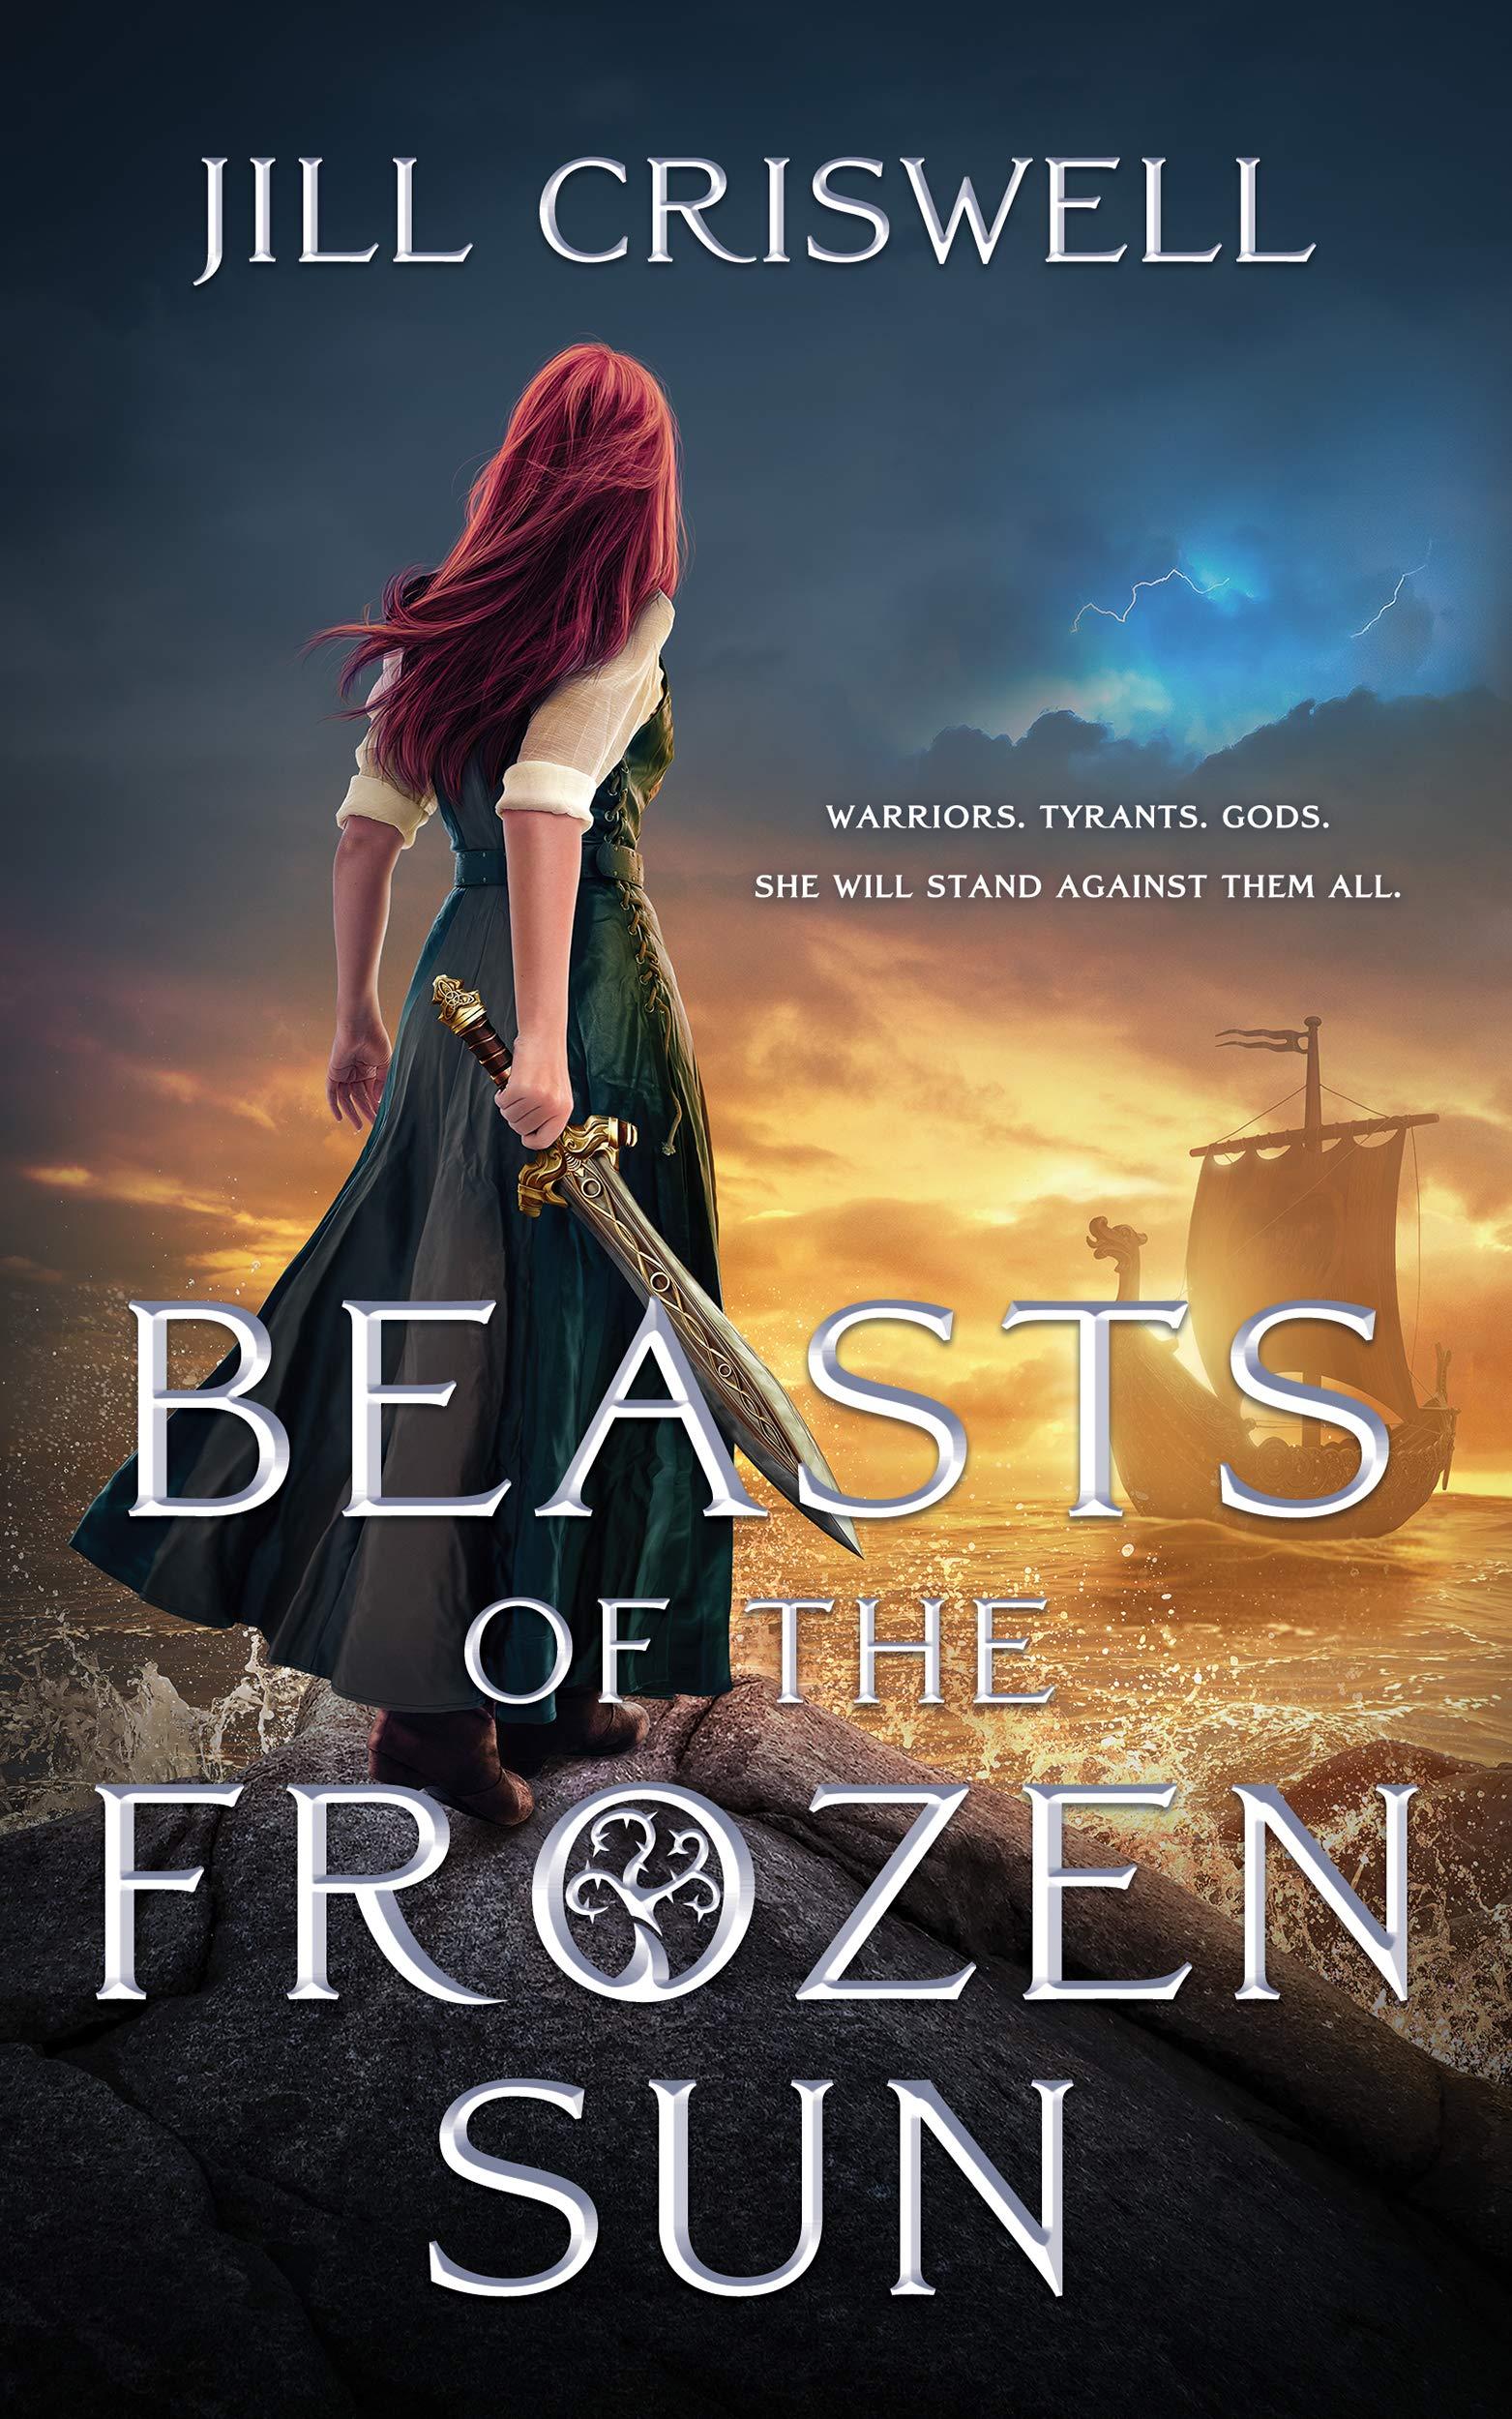 Title:  Beasts of the Frozen Sun (Frozen Sun Saga #1) , Author: Jill Criswell, Publisher: Blackstone Publishing, Publish Date: August 6, 2019, Genre(s): YA, Young Adult, Fantasy, YA Fantasy